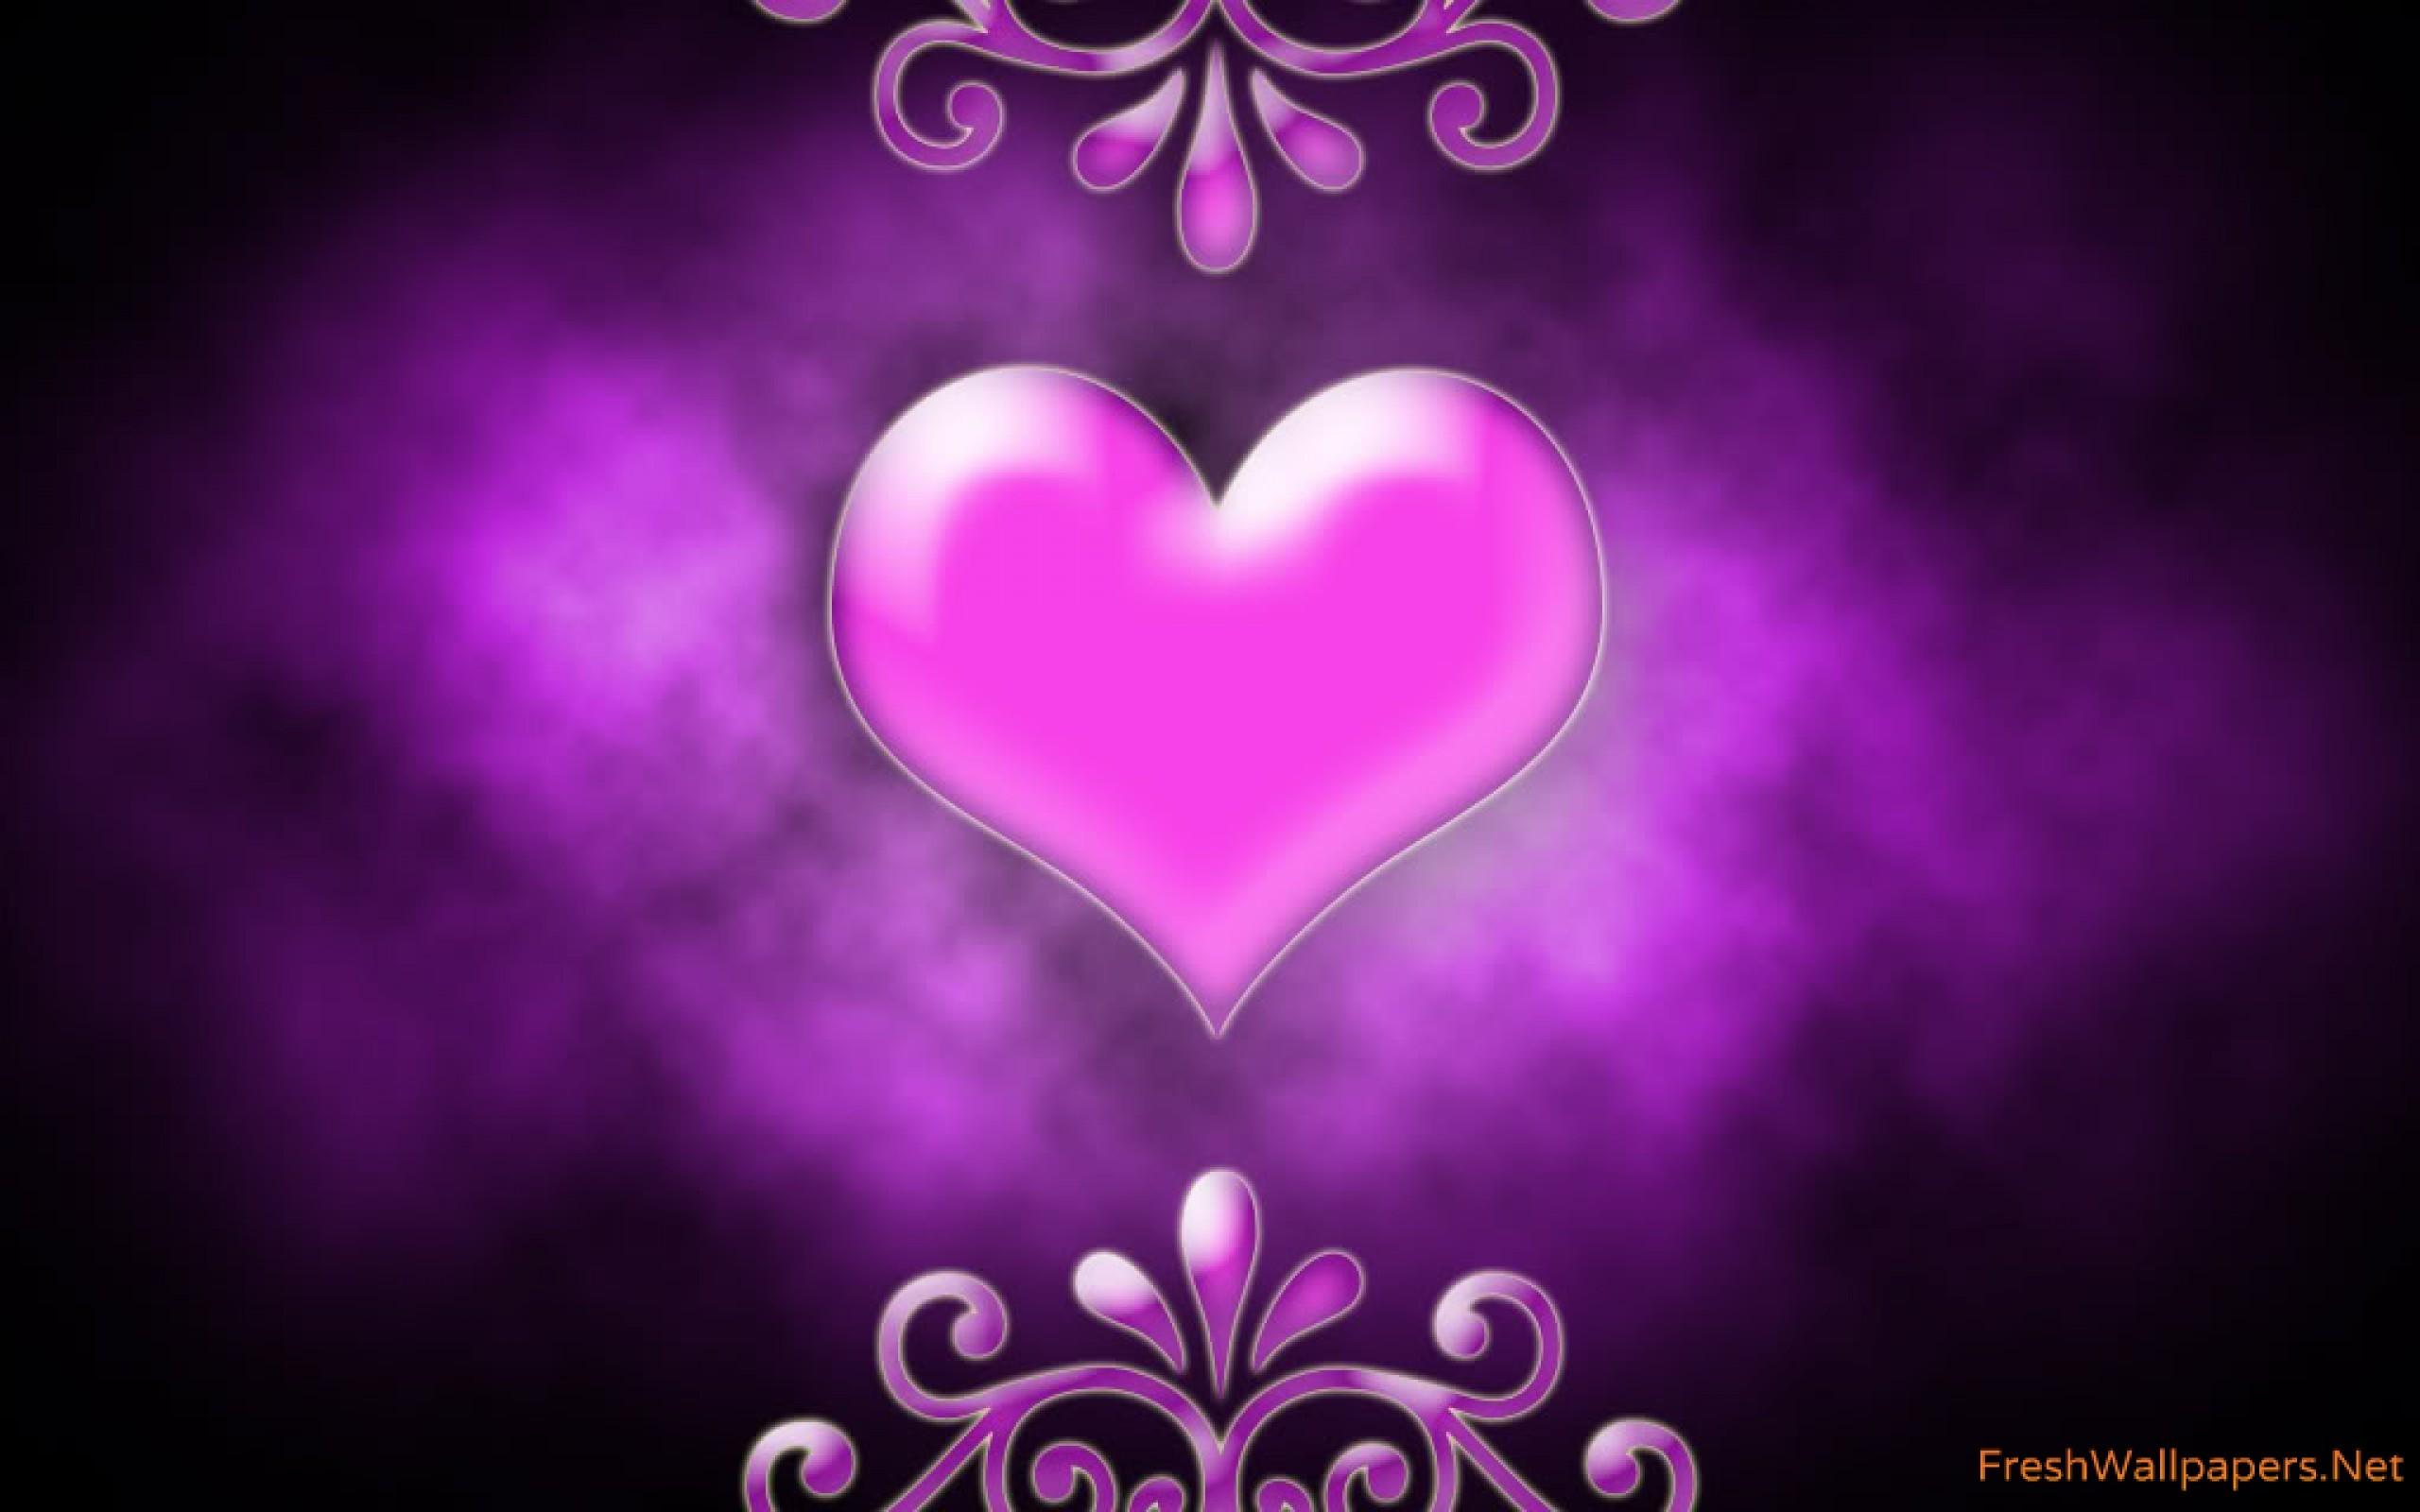 Purple And Black Hearts Wallpaper: Purple Hearts Wallpaper (58+ Images